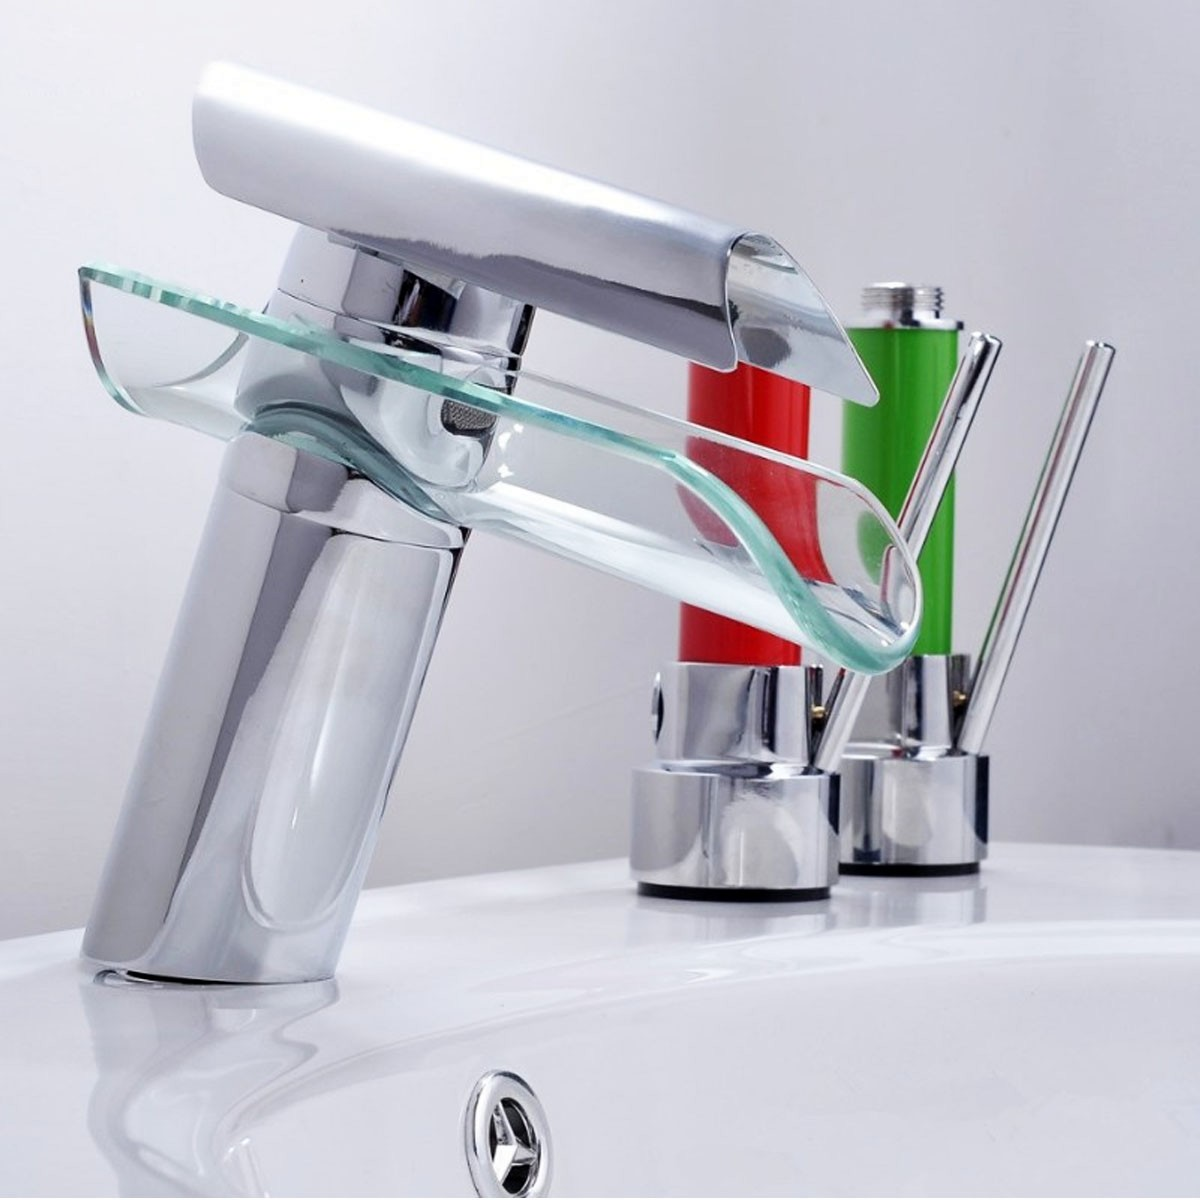 New Stunning Bathroom Faucet Advanced Modern Glass Waterfall Contemporary Chrome  Brass Bathroom Basin Sink Mixer Waterfall